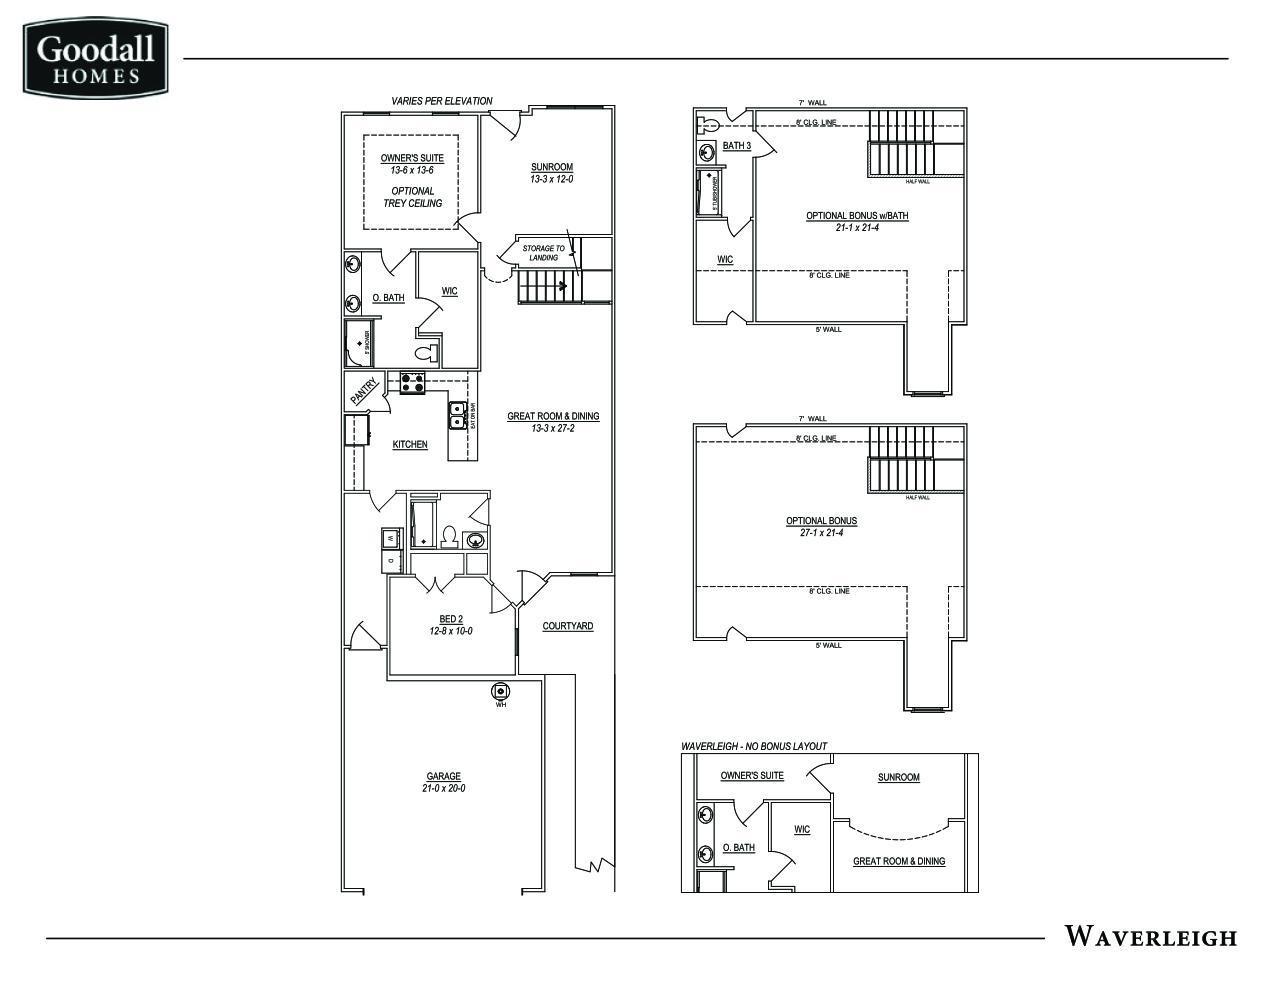 Goodall Start All Wiring Diagram On Goodall Start All Wiring Diagram